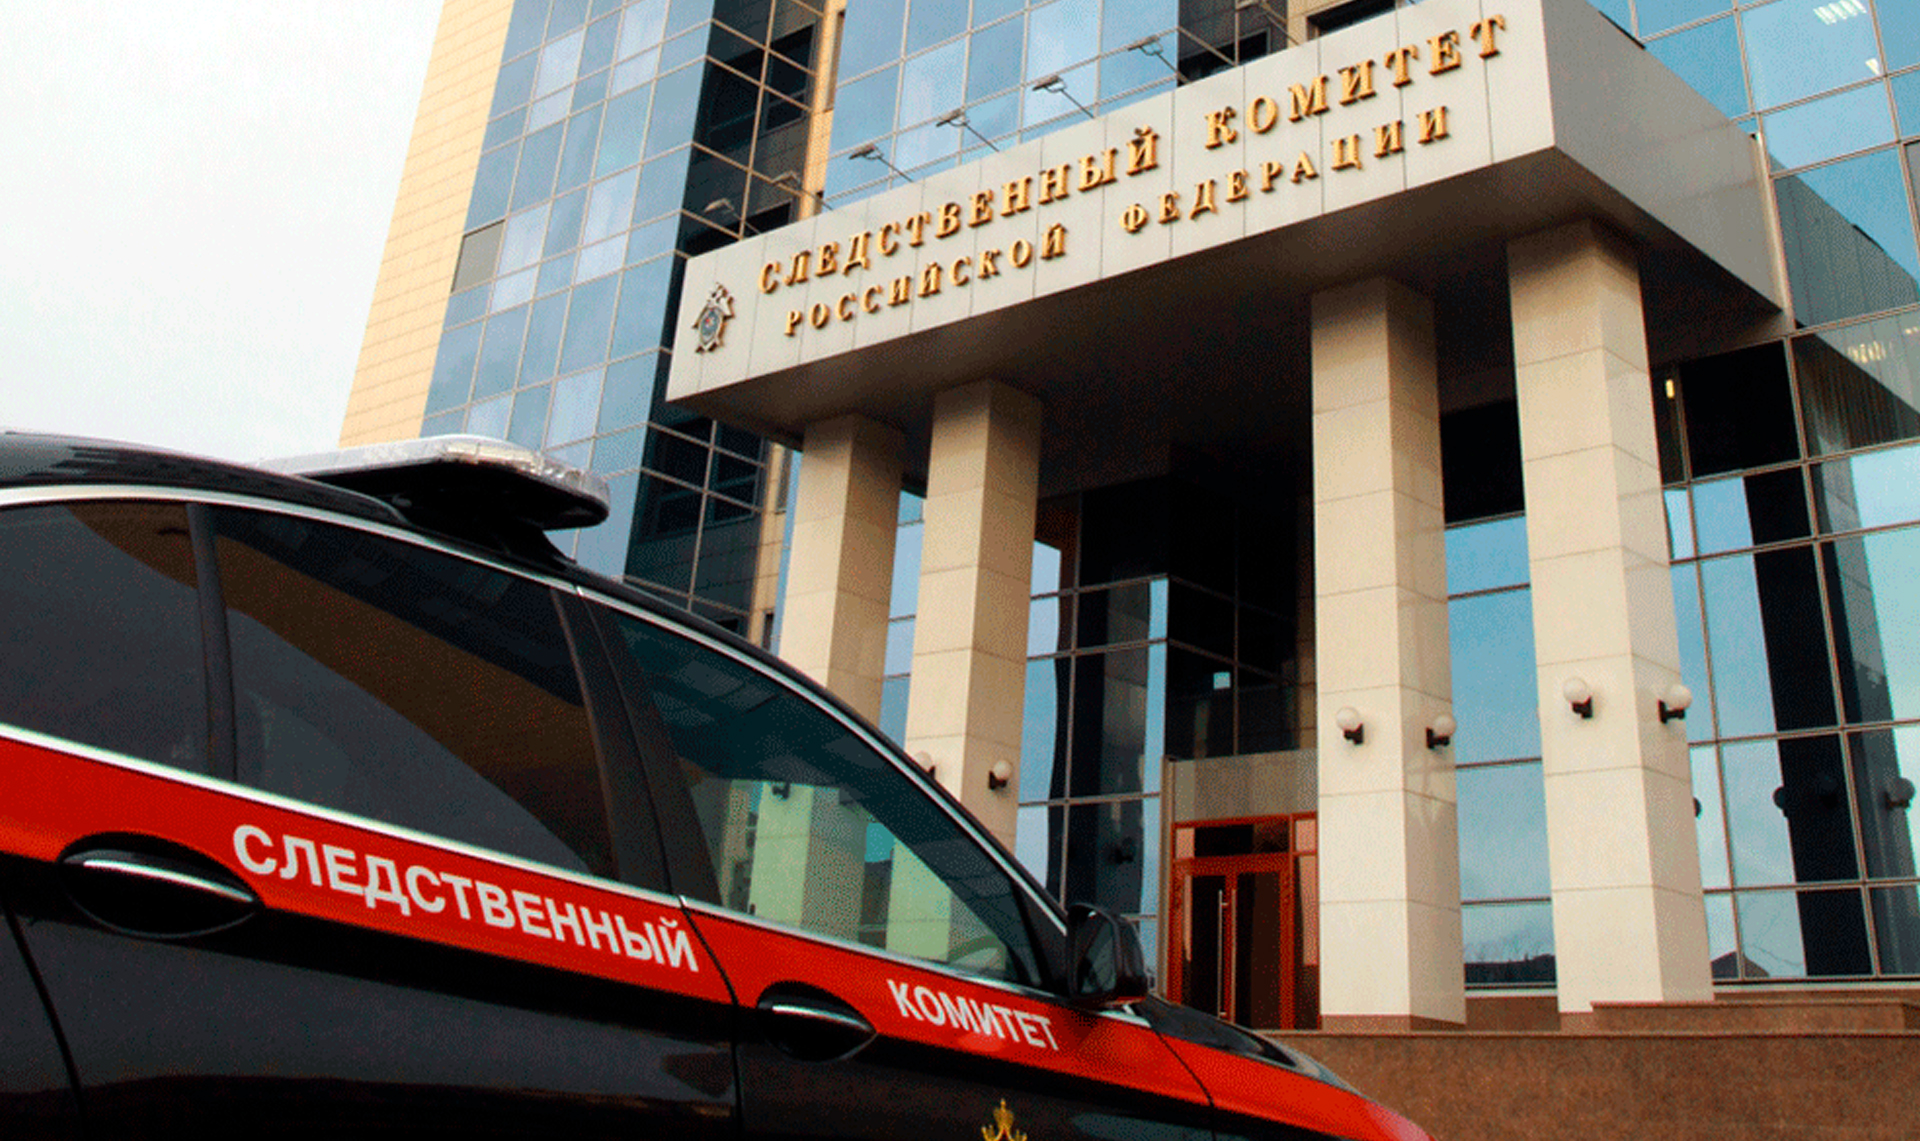 В московской аптеке изъяли партии украденных лекарств от коронавируса и артрита